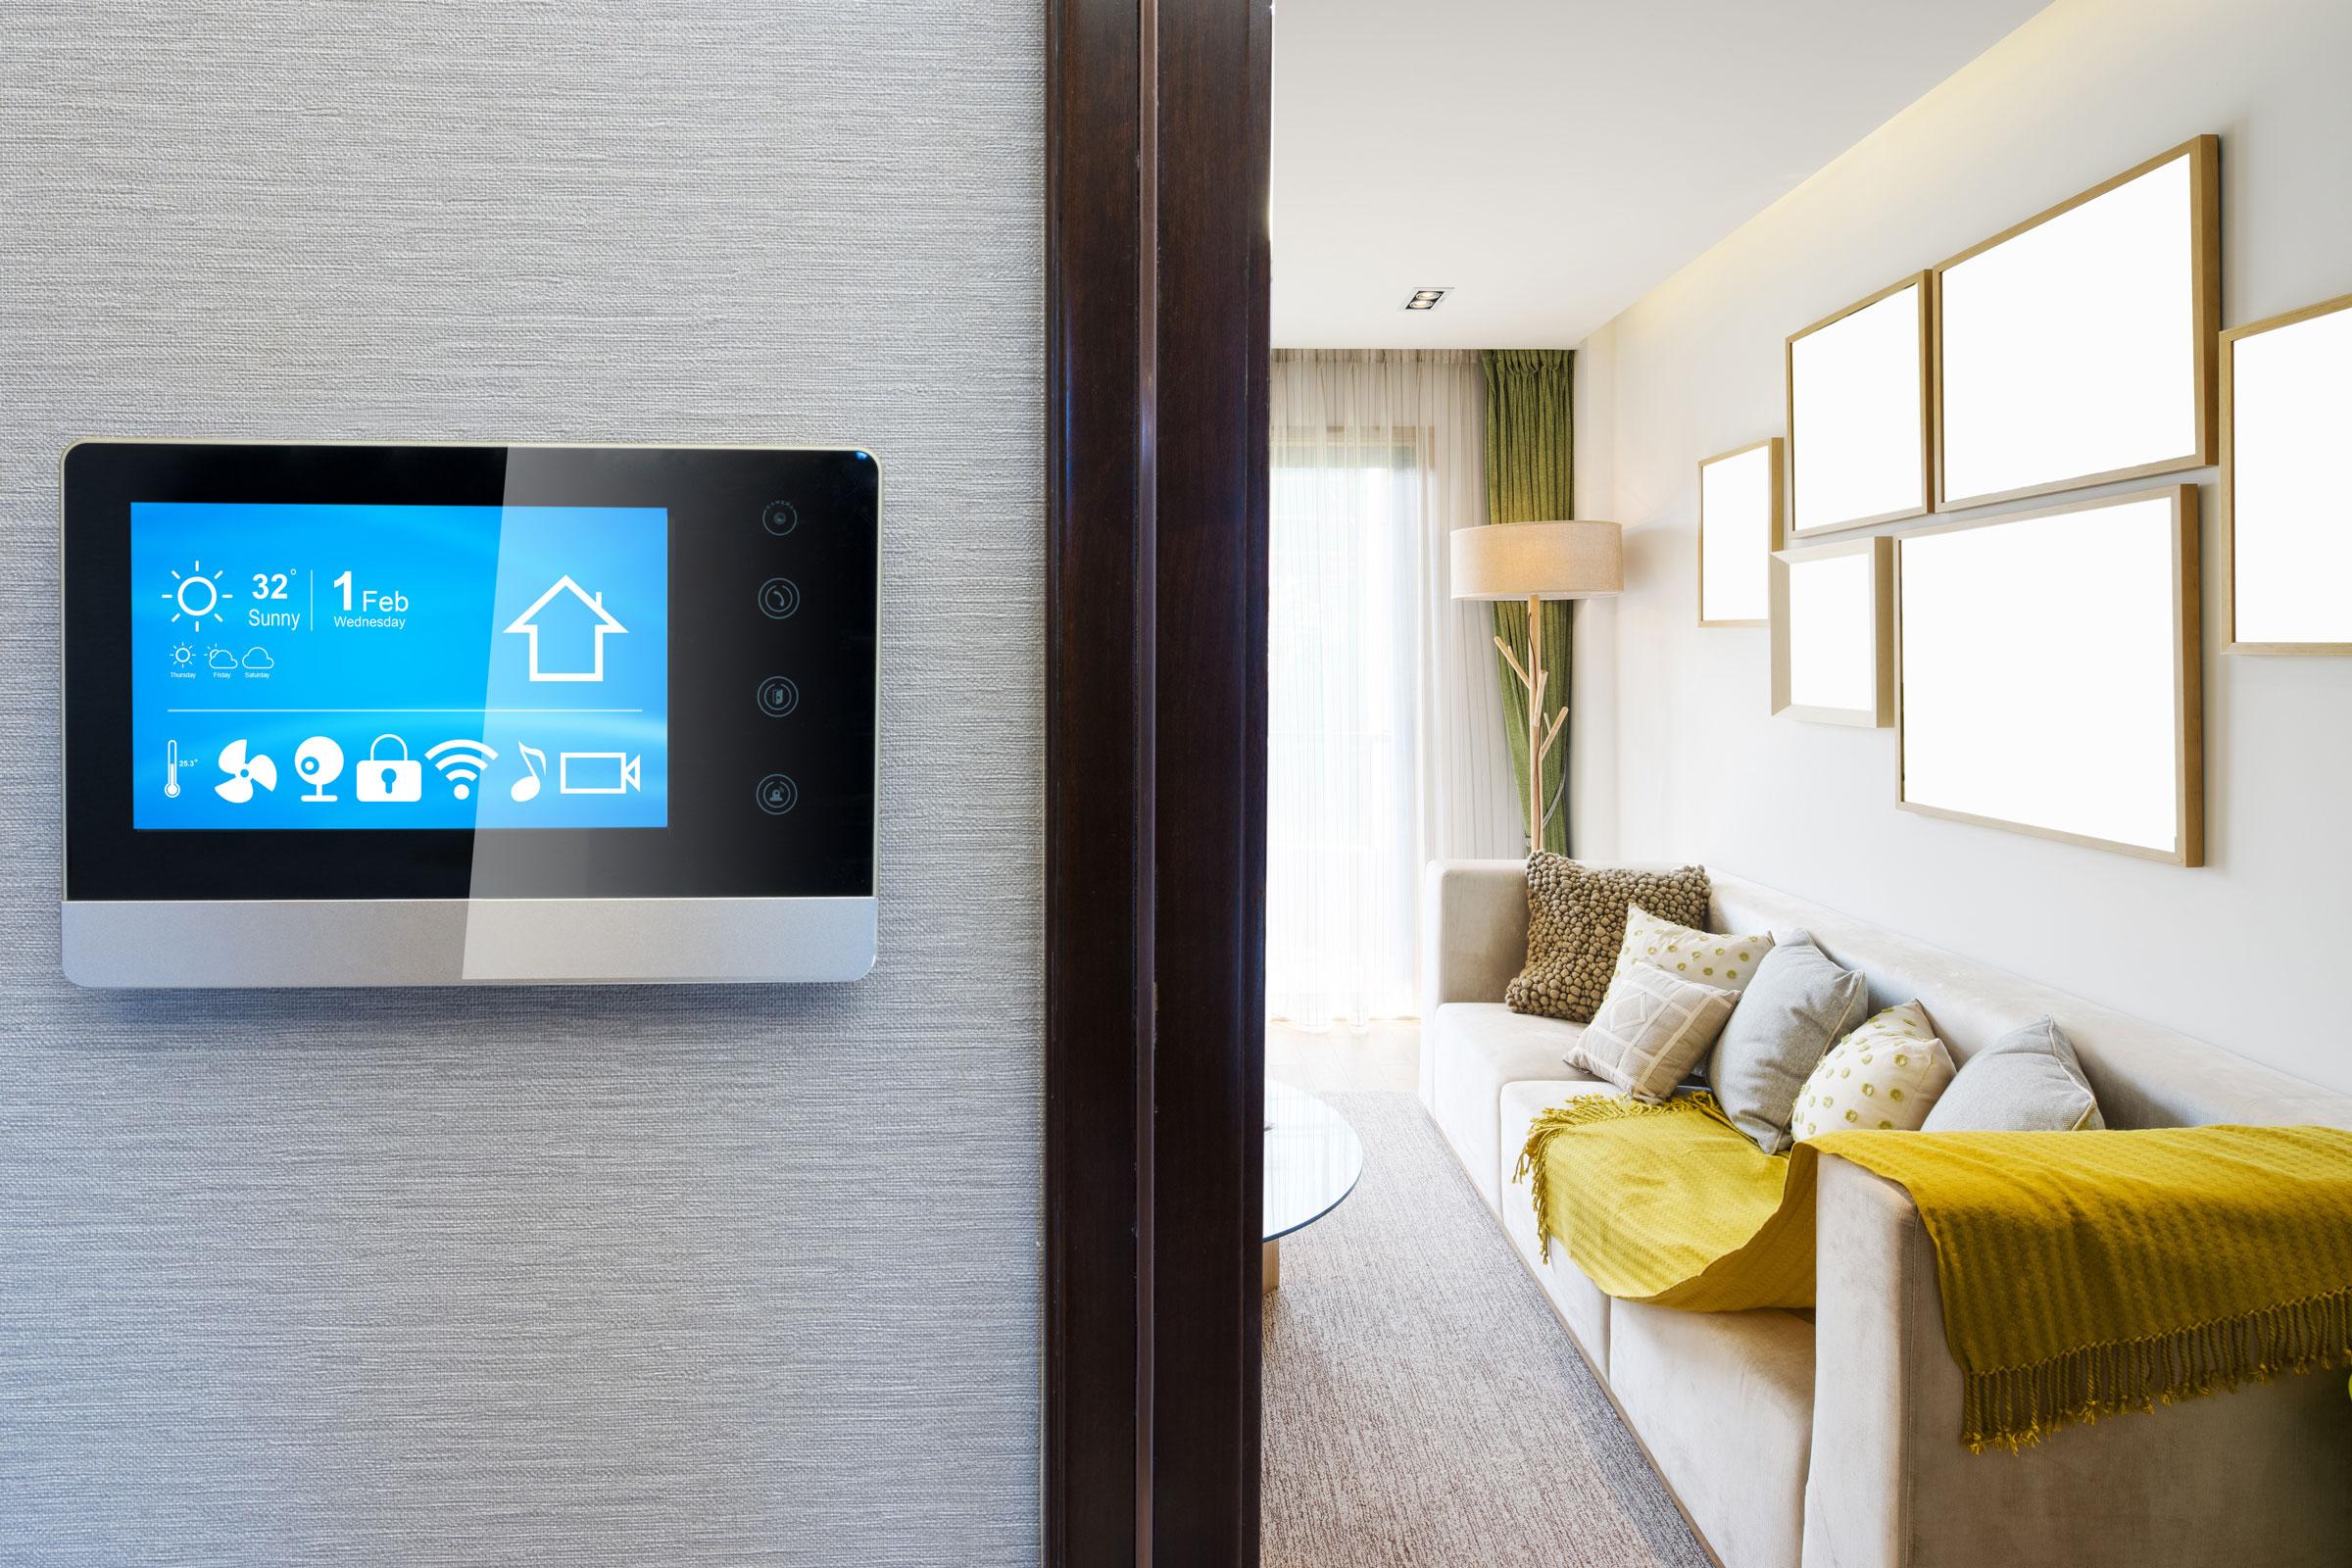 Smart living photo gallery kit LA PLAGE DE BASSAM TRANSFORMEE EN HOTEL DE PASSE : REGARDS